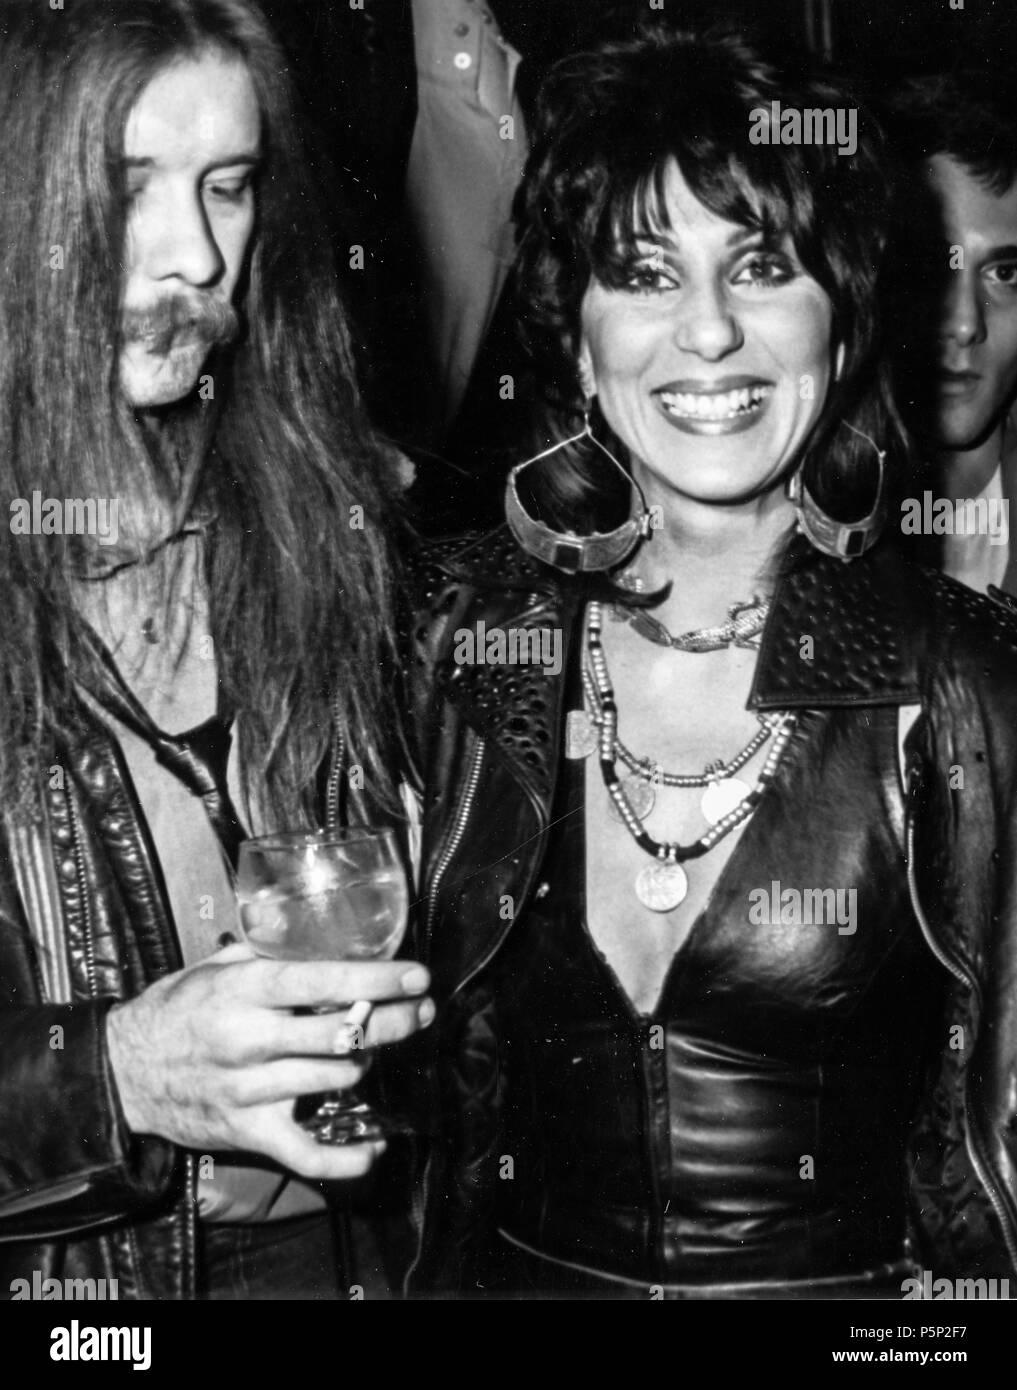 Cher, fiesta, Hollywood, los ángeles, 60s Imagen De Stock